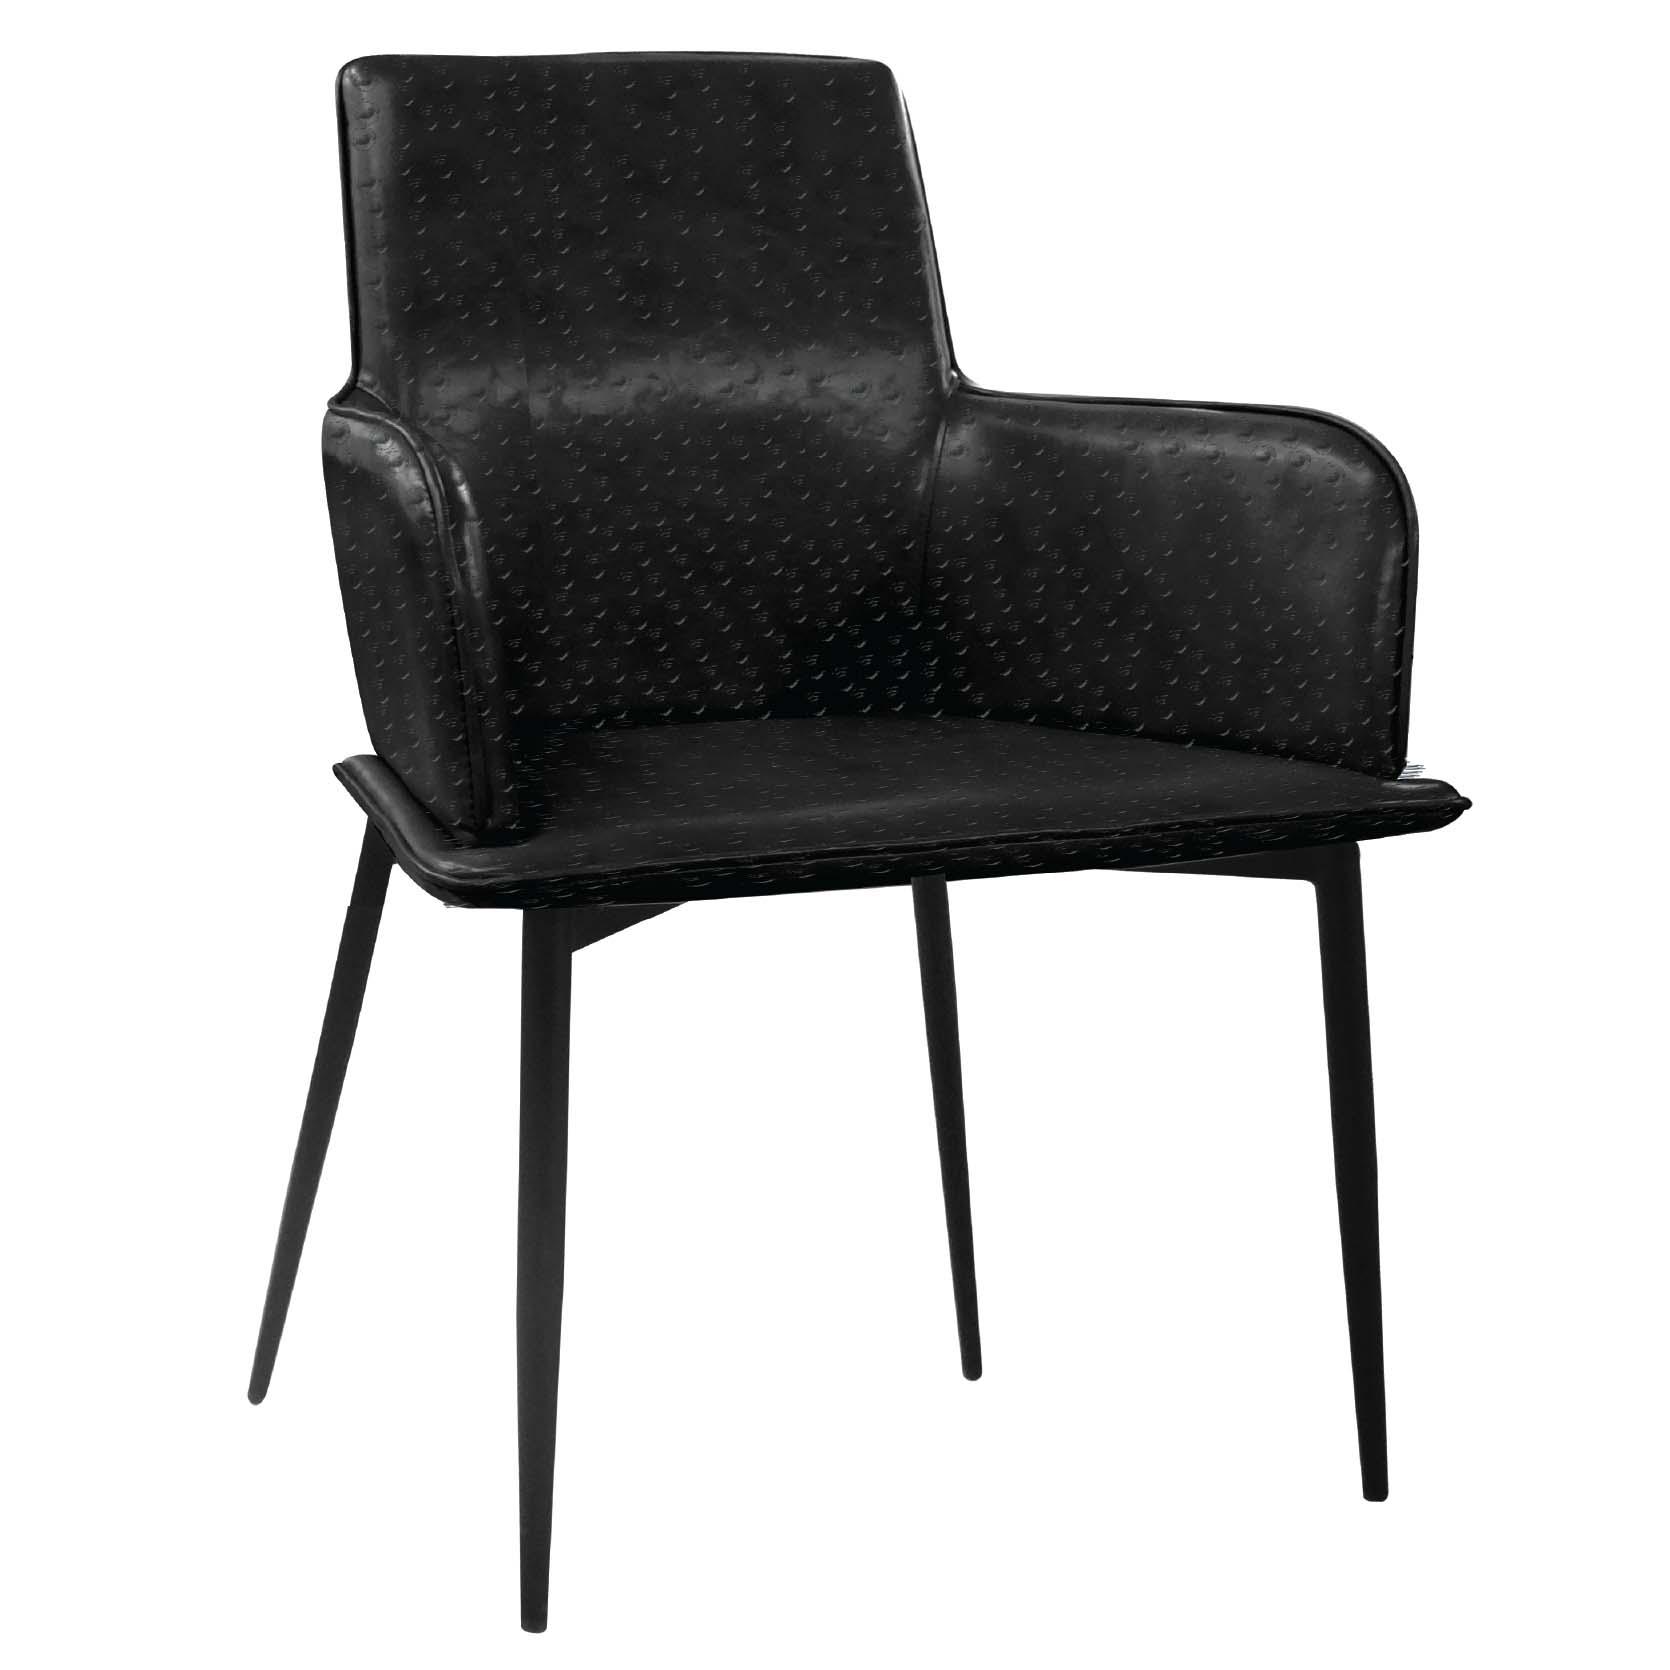 Phoenix Lux Furniture Rentals : 155 wolfgang from www.luxfurniturerentals.com size 1670 x 1670 jpeg 87kB